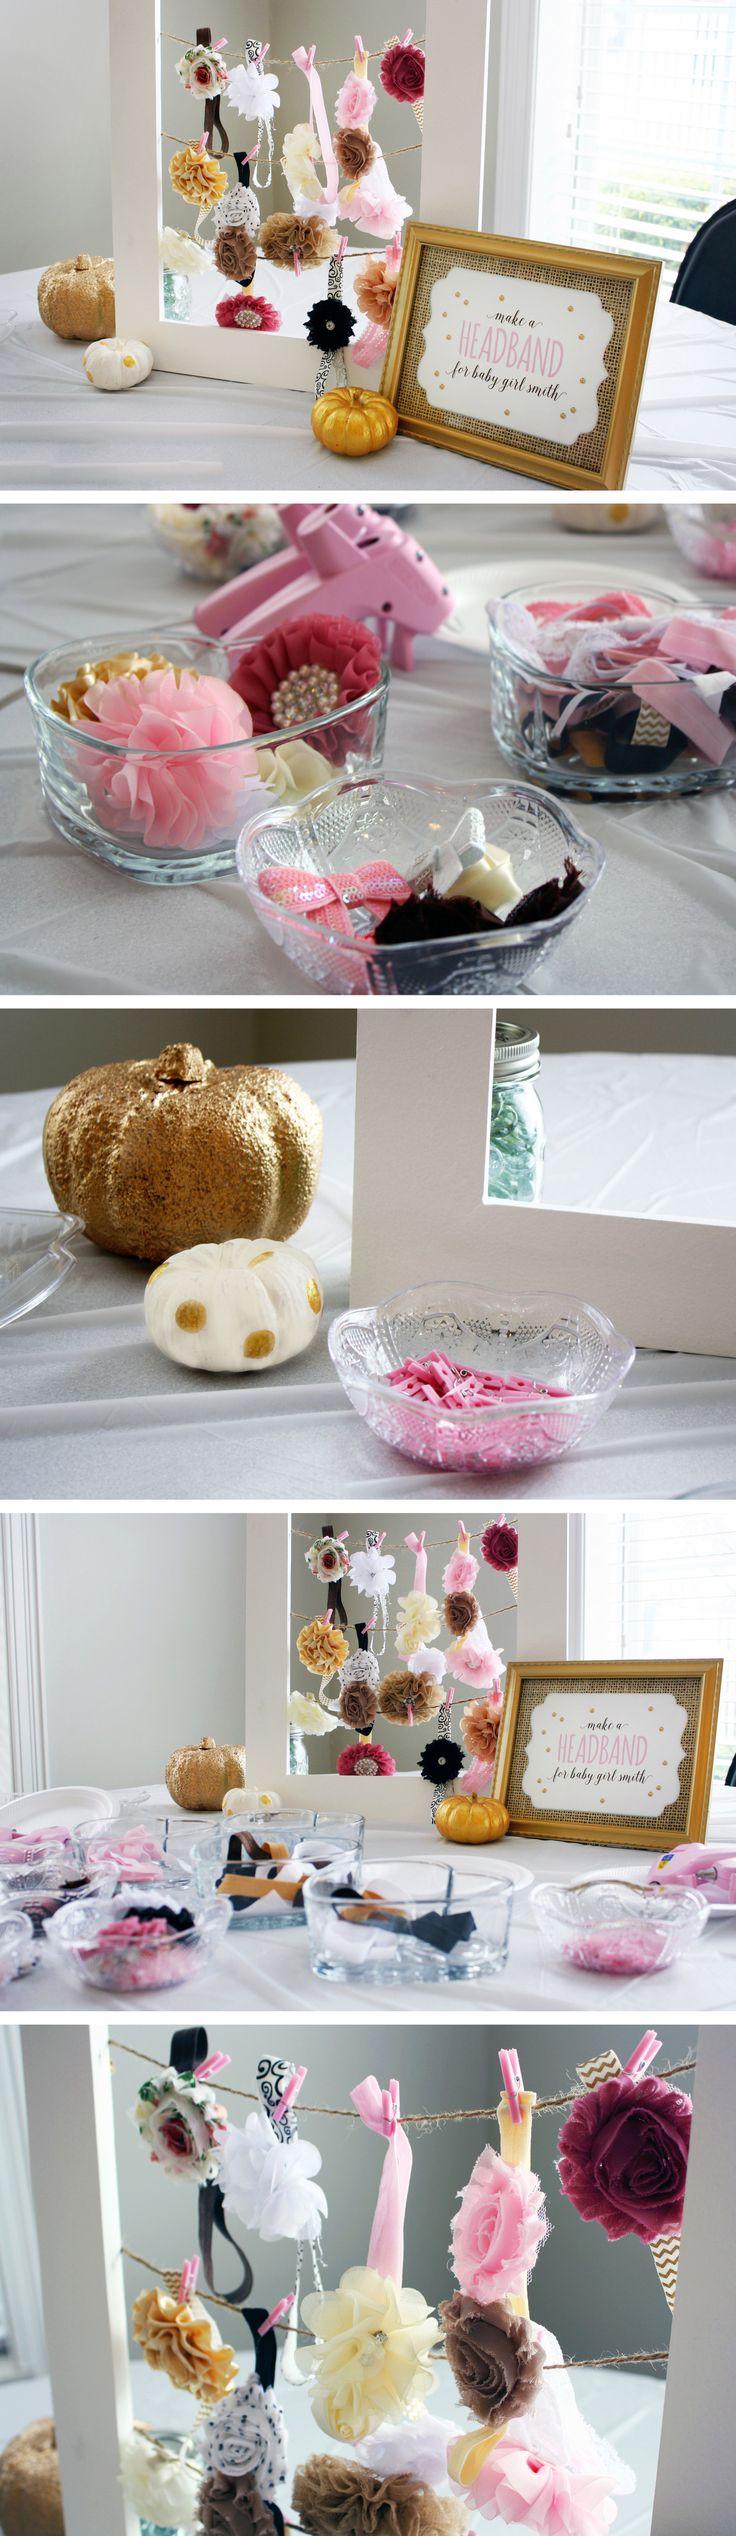 "Modern Glam ""Little Pumpkin"" DIY Headband Making Station"